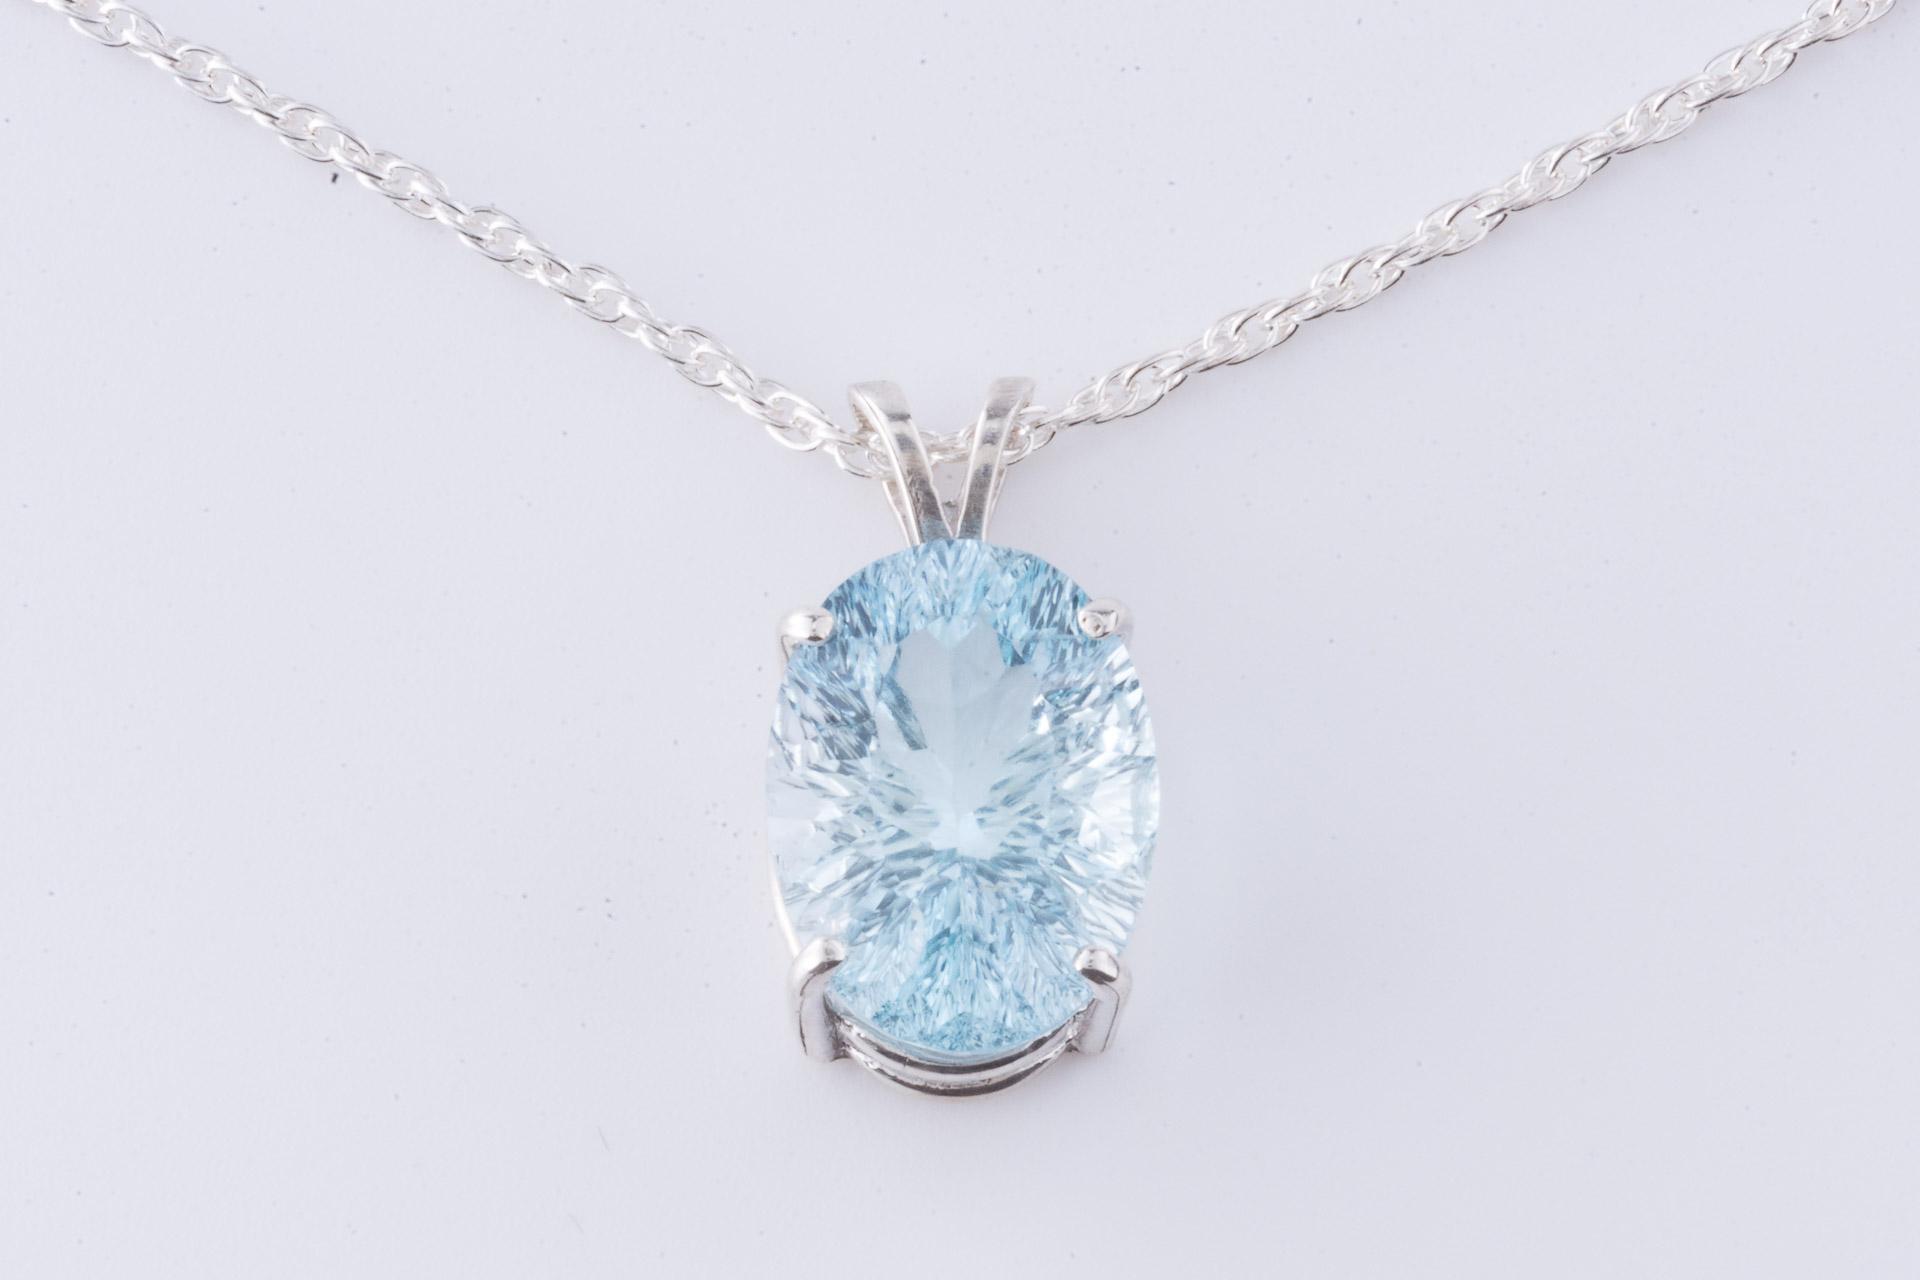 Ice blue topaz pendant pinnacle 5 minerals ice blue topaz pendant mozeypictures Images